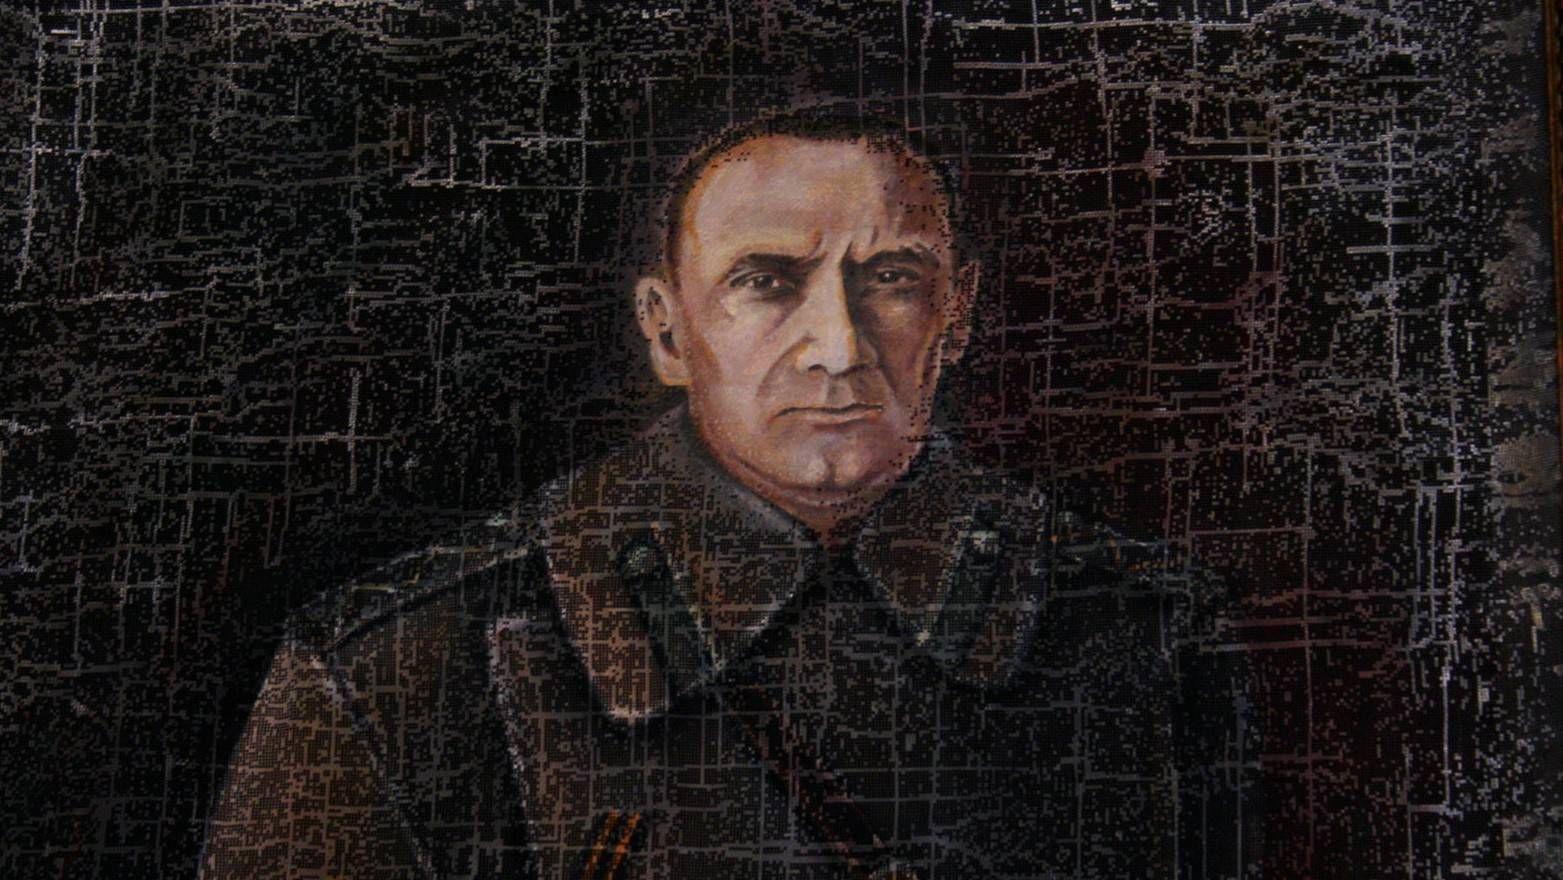 Портрет А.В. Колчака, худ. С. Баранов